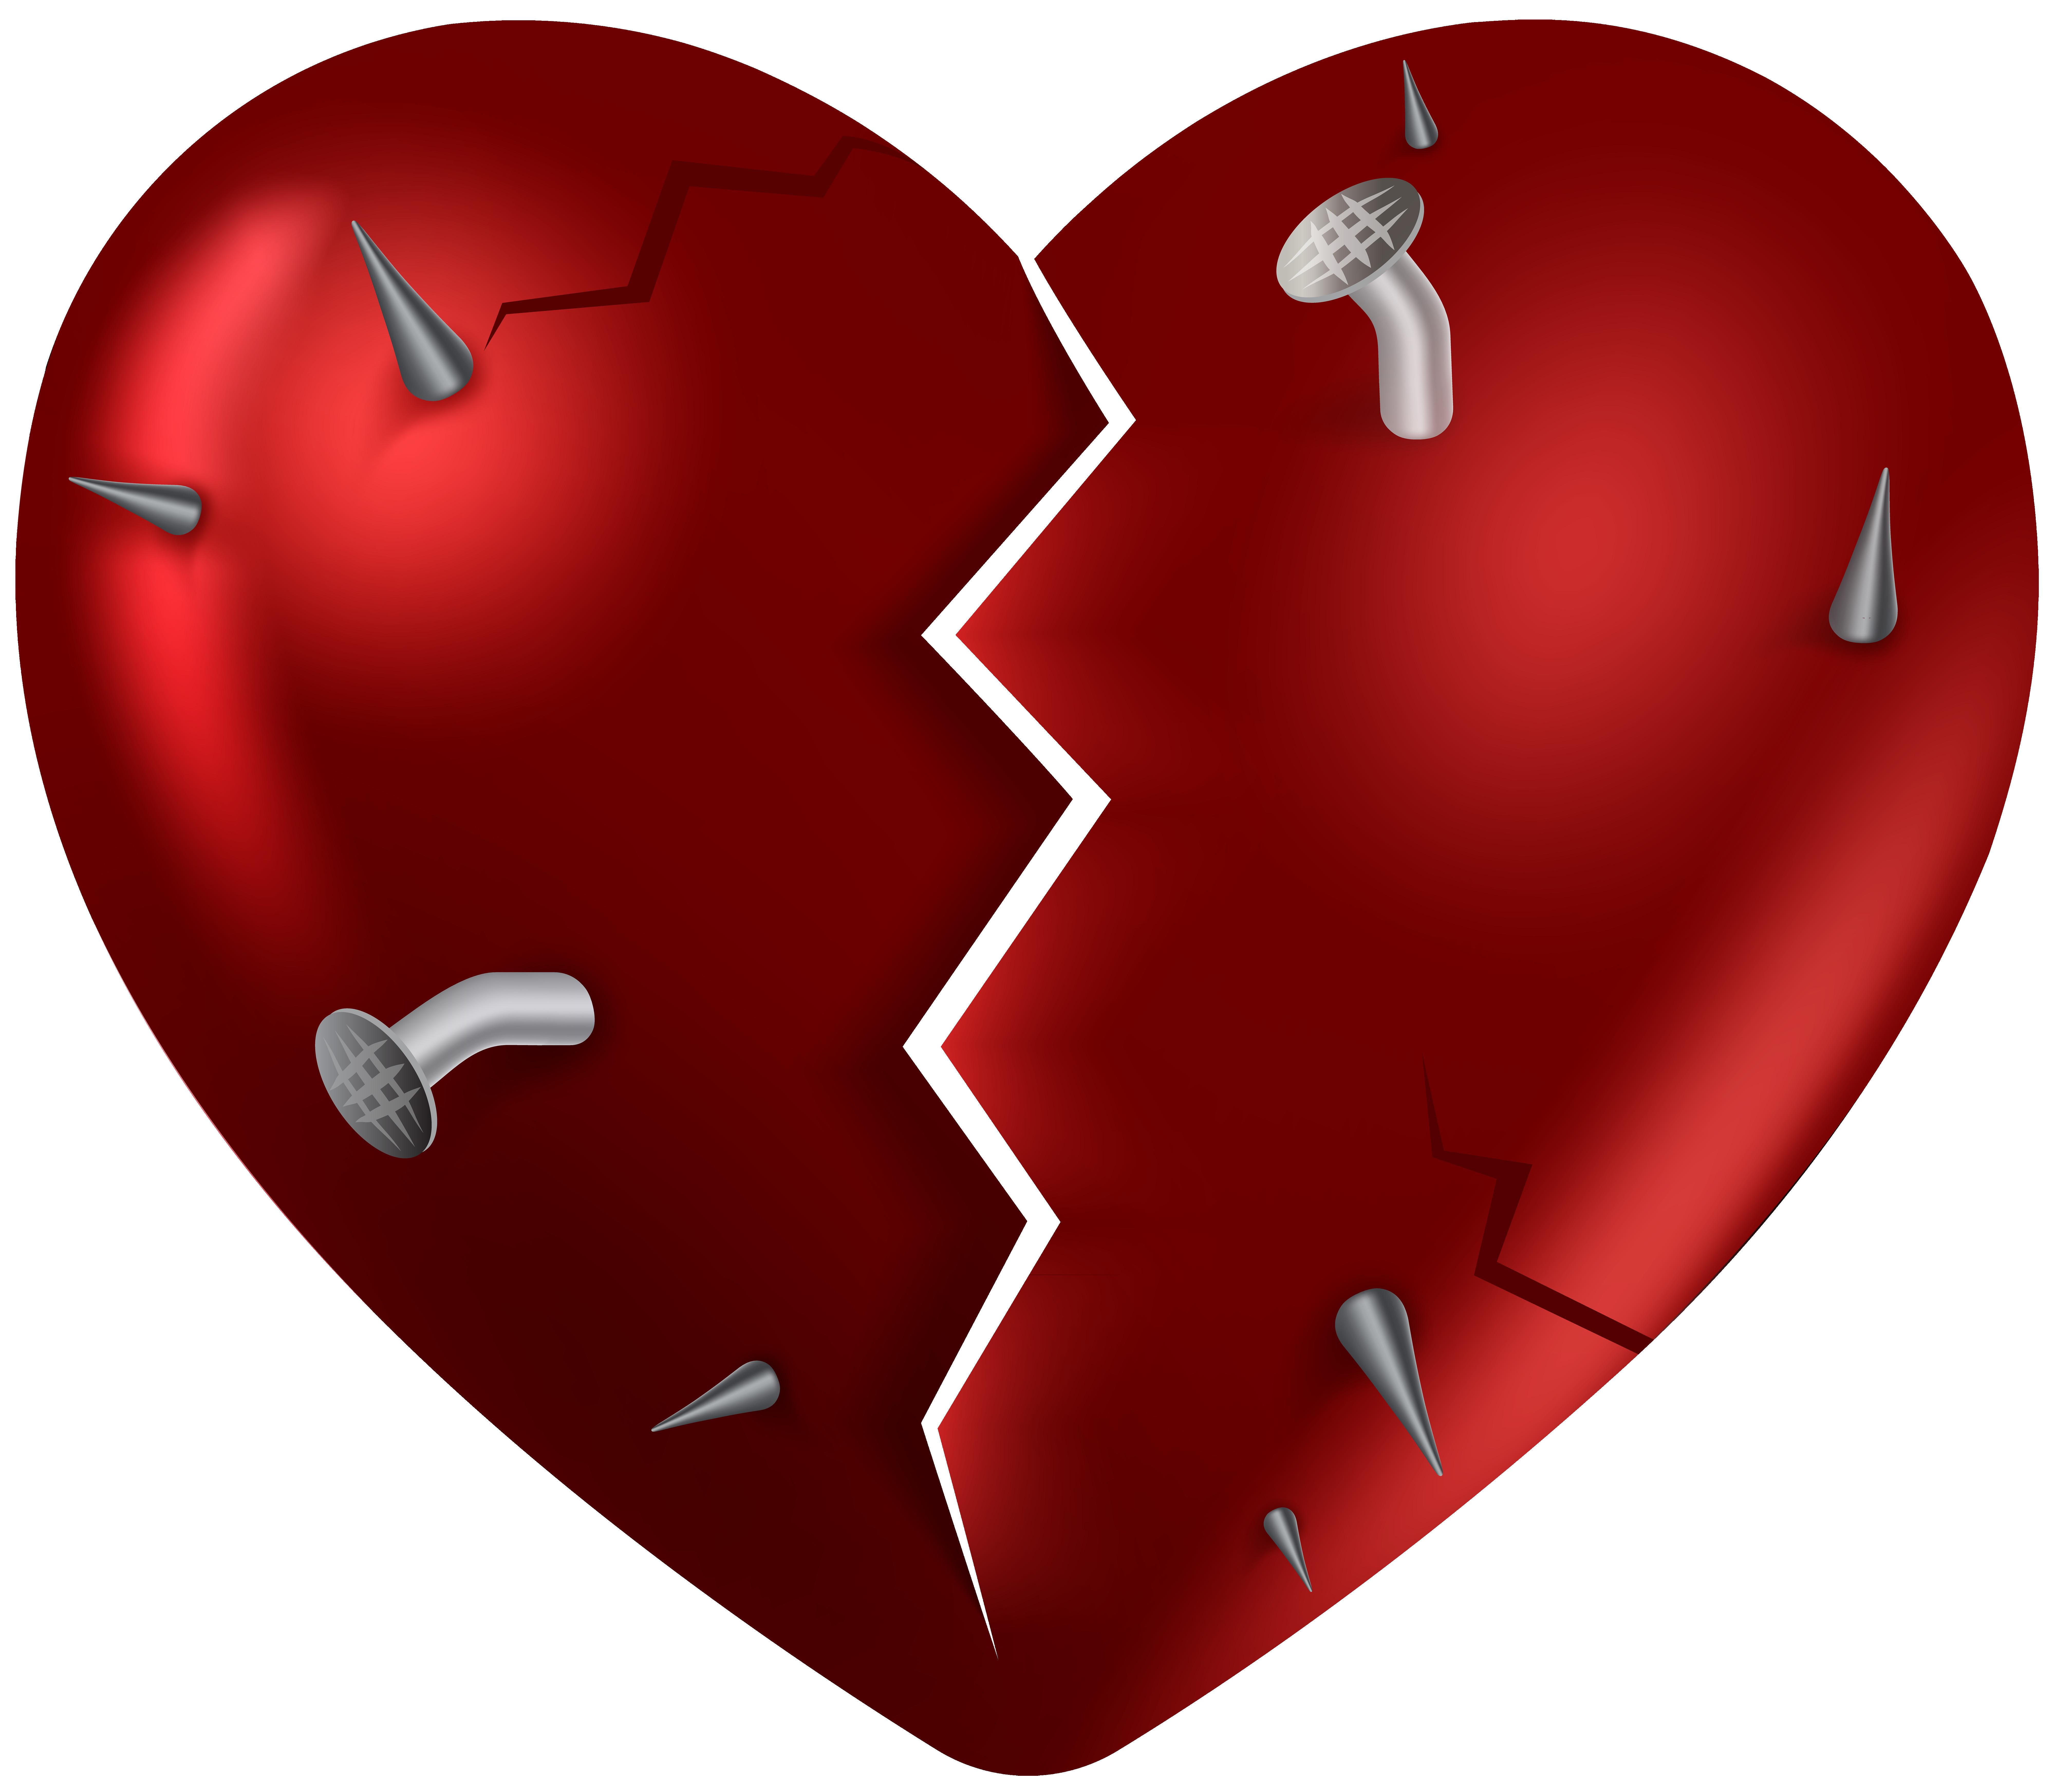 8000x6975 Broken Heart Png Clip Art Image Gallery Yopriceville High